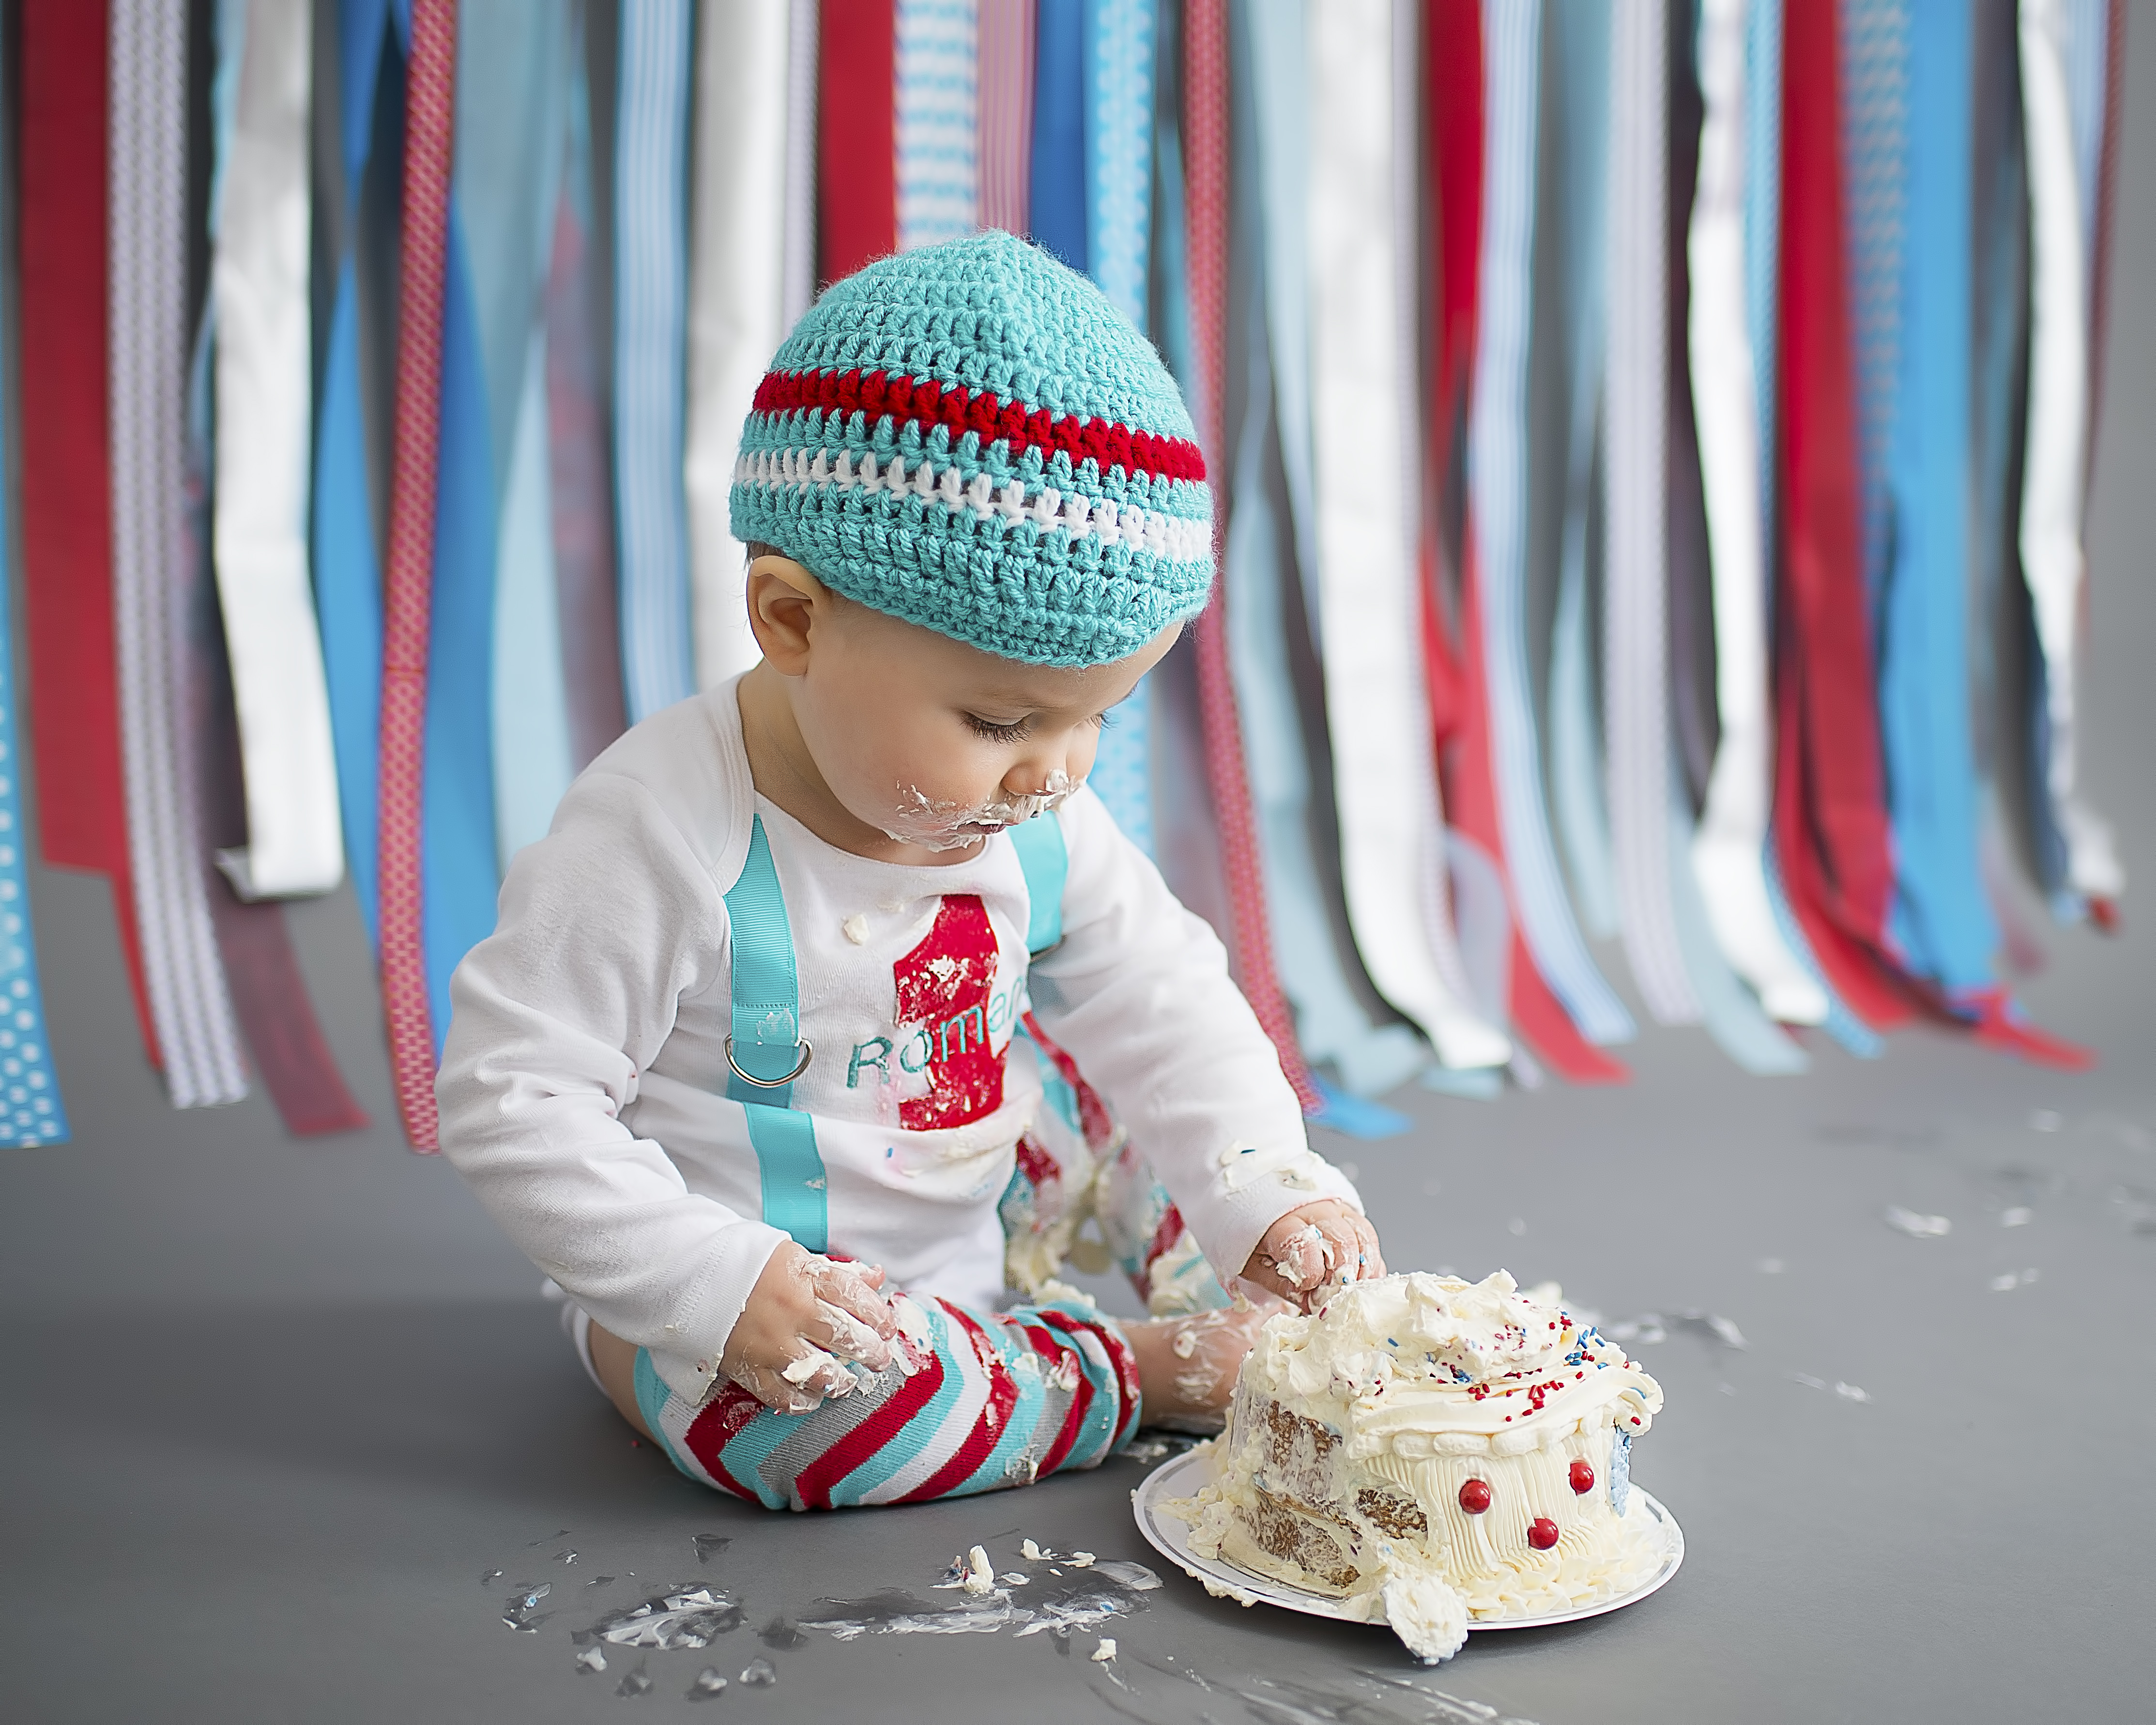 Cake smash session